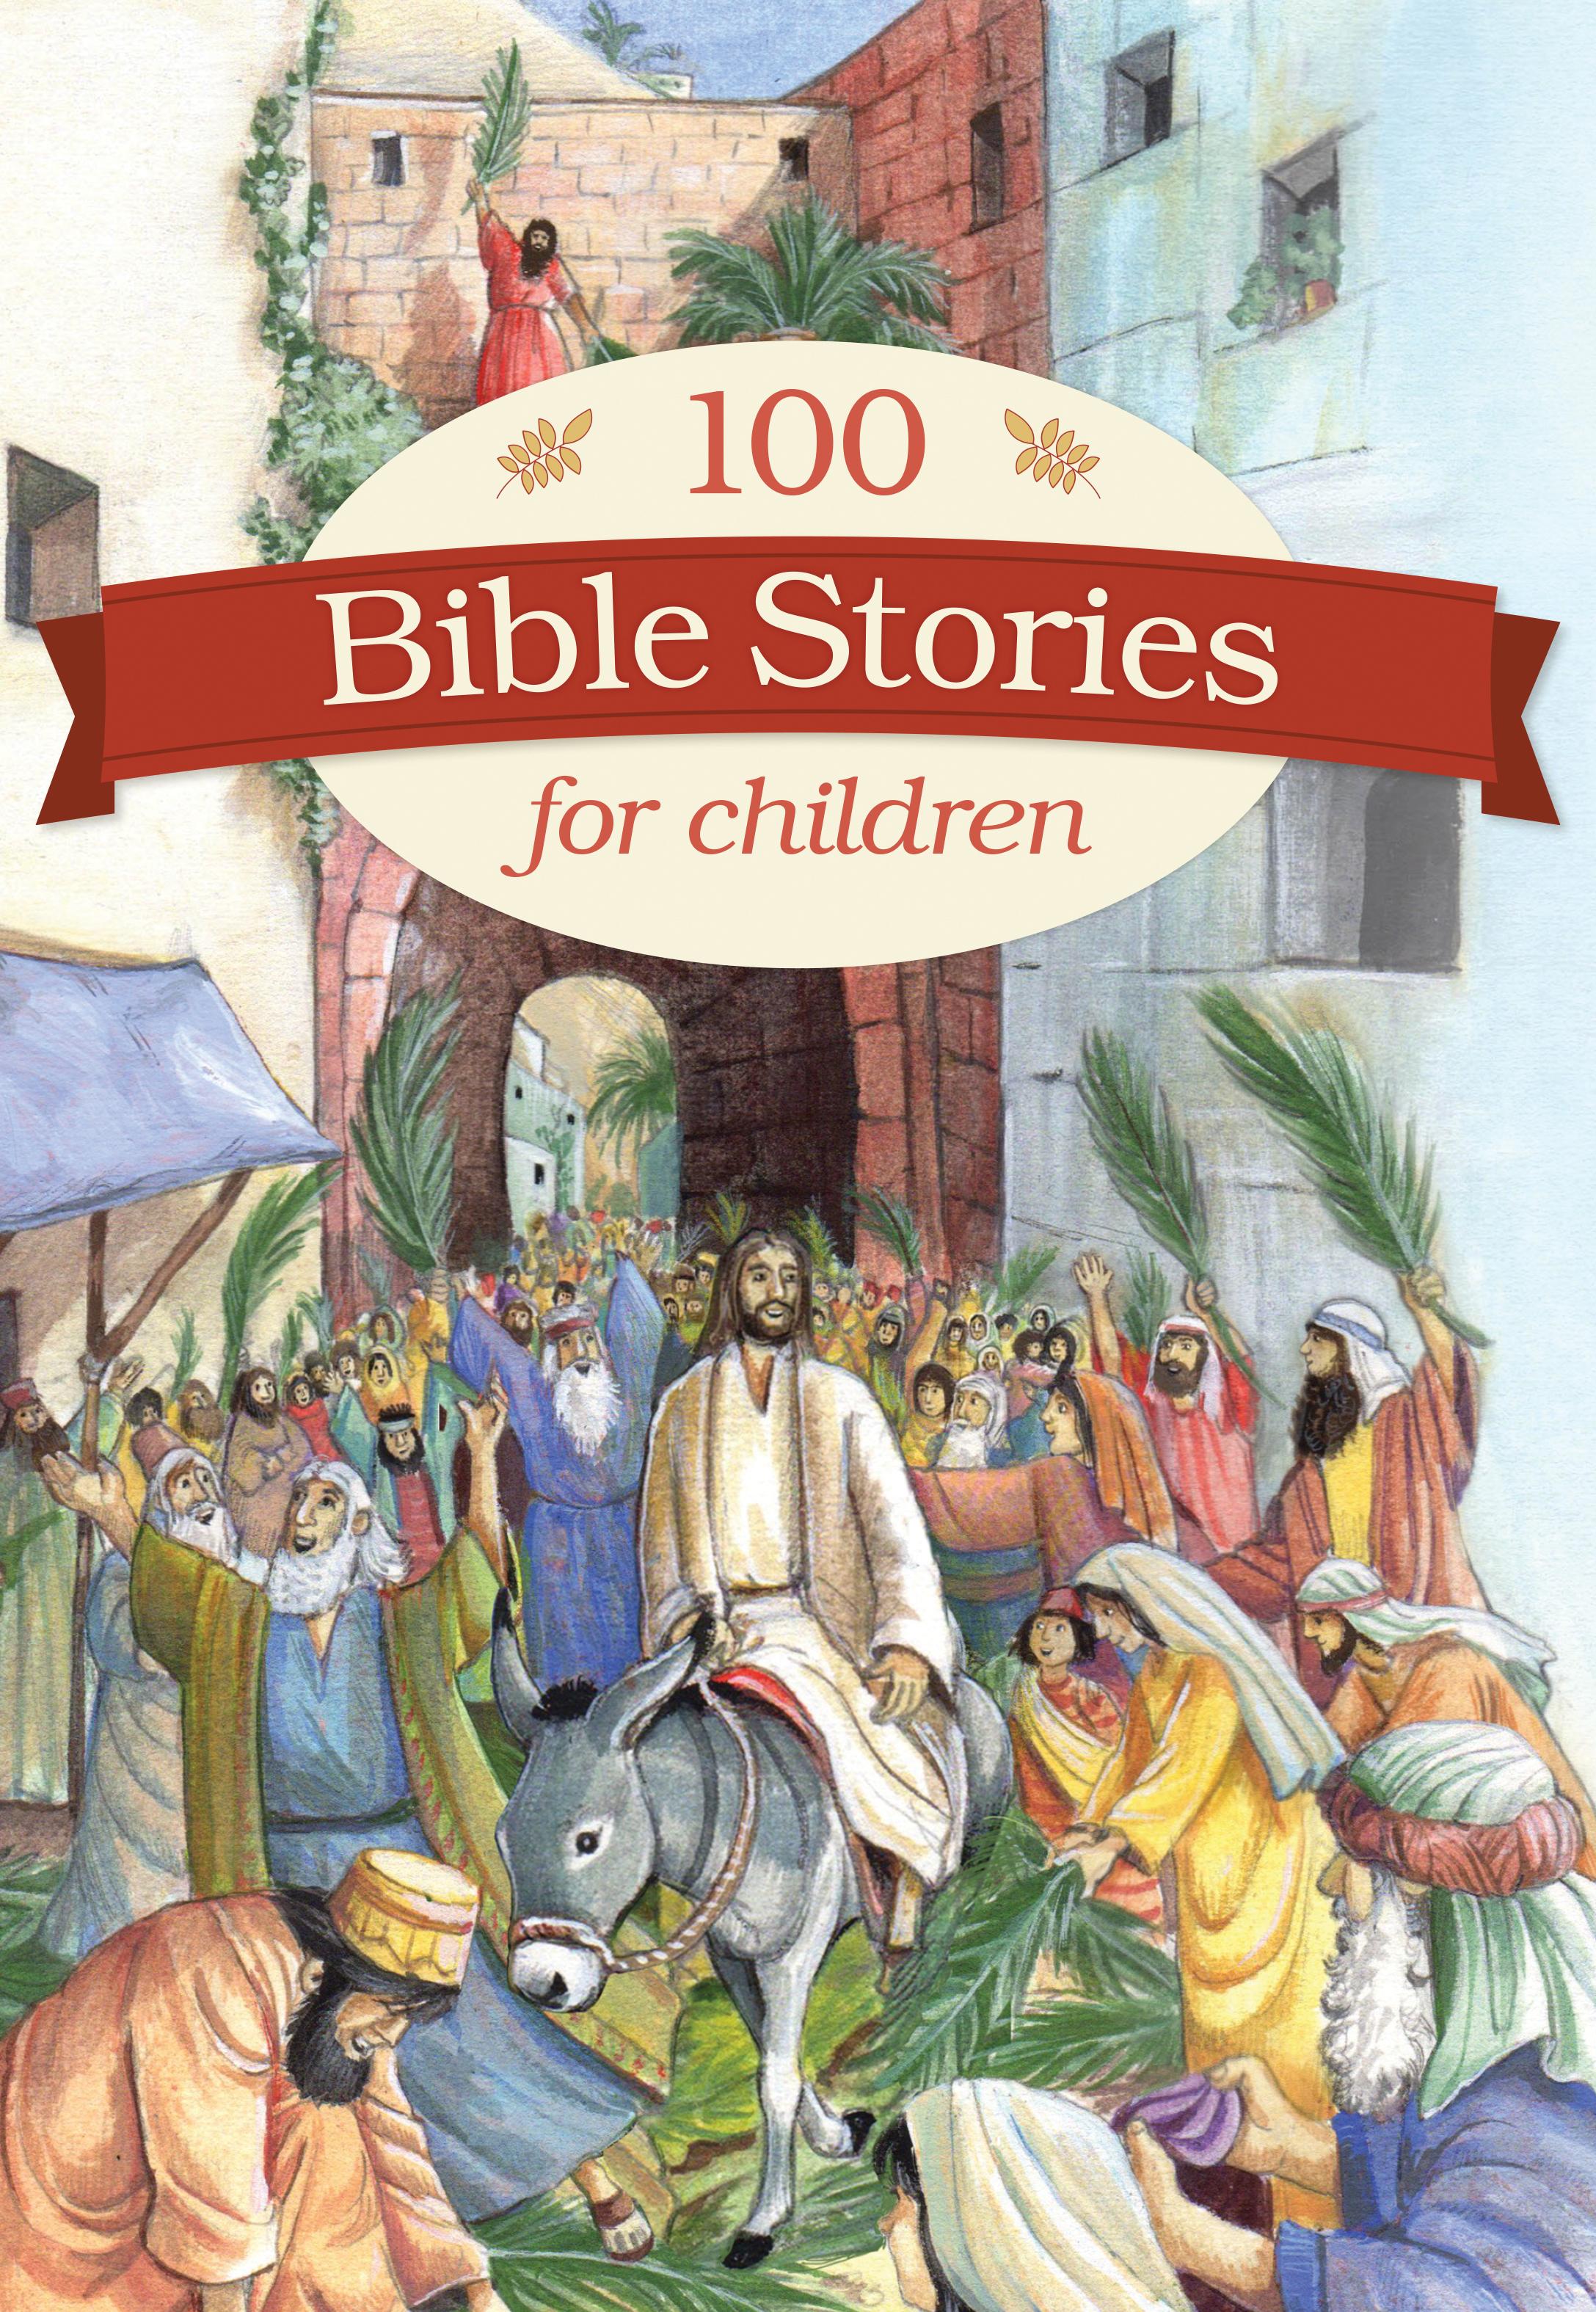 100 Bible Stories for Children